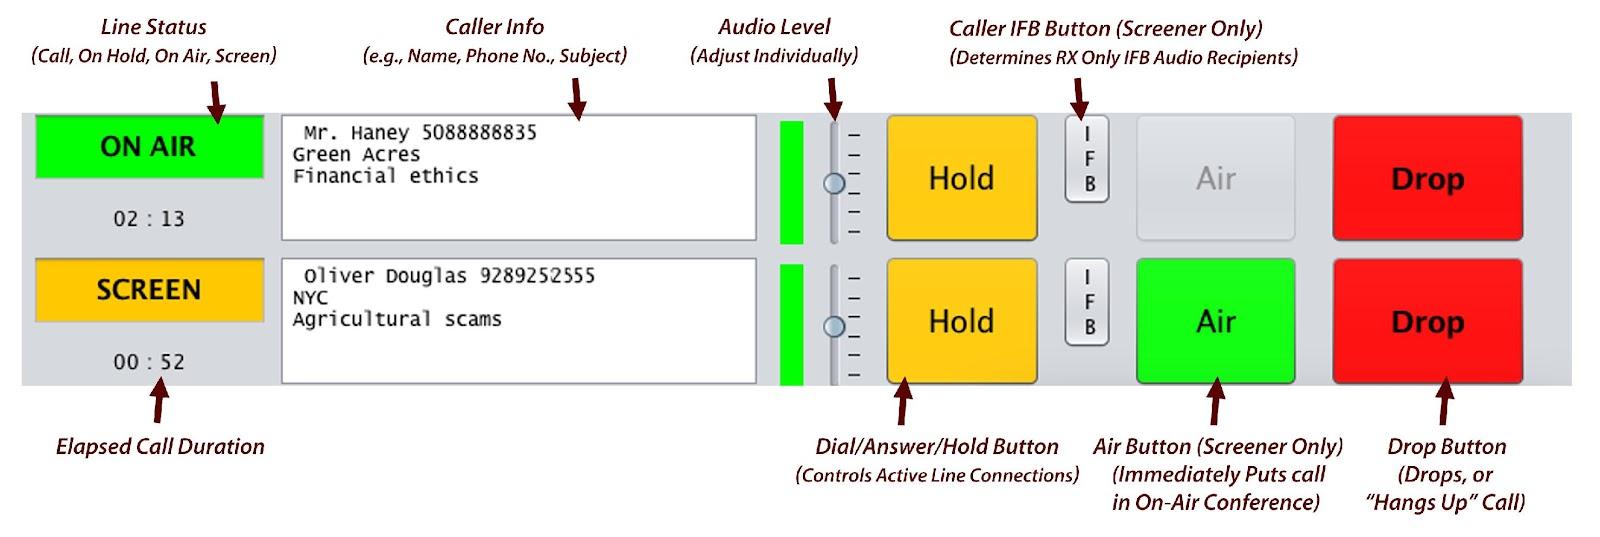 :Backbone Talk Docs Images:Line item pointers2.jpg